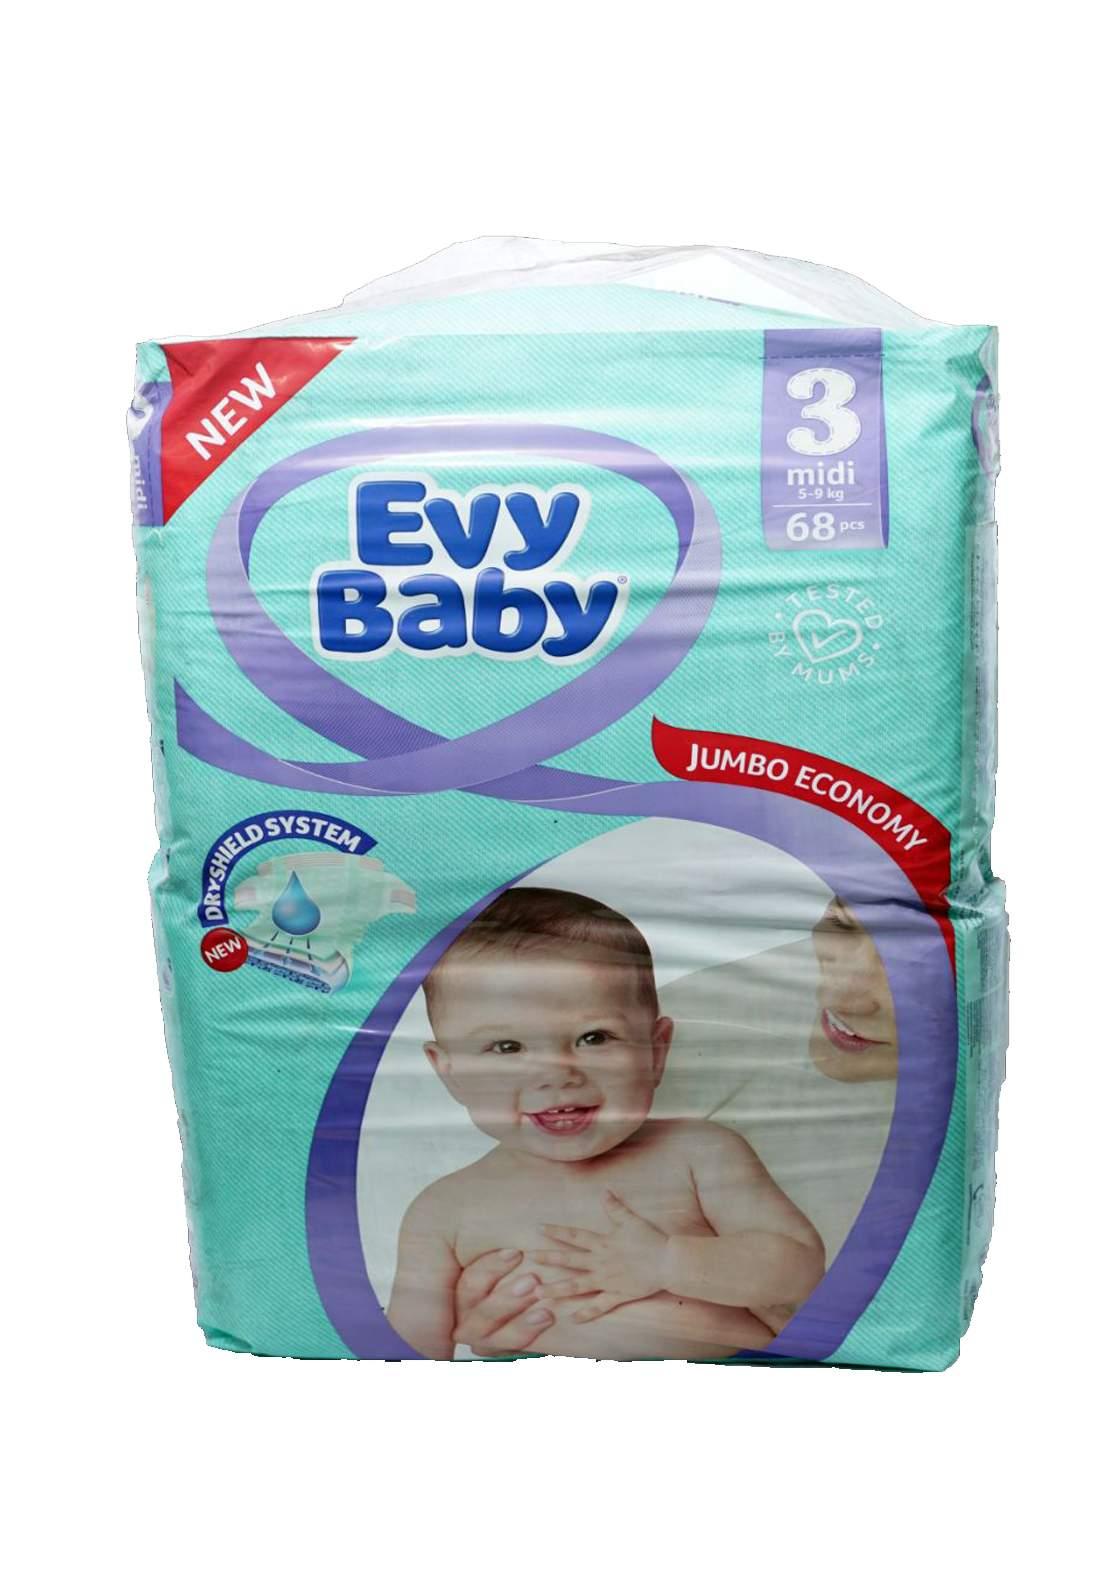 Evy Baby Diapers 3 Midi 5-9 Kg 68 Pcs 3 حفاضات ايفي بيبي للاطفال عادي رقم